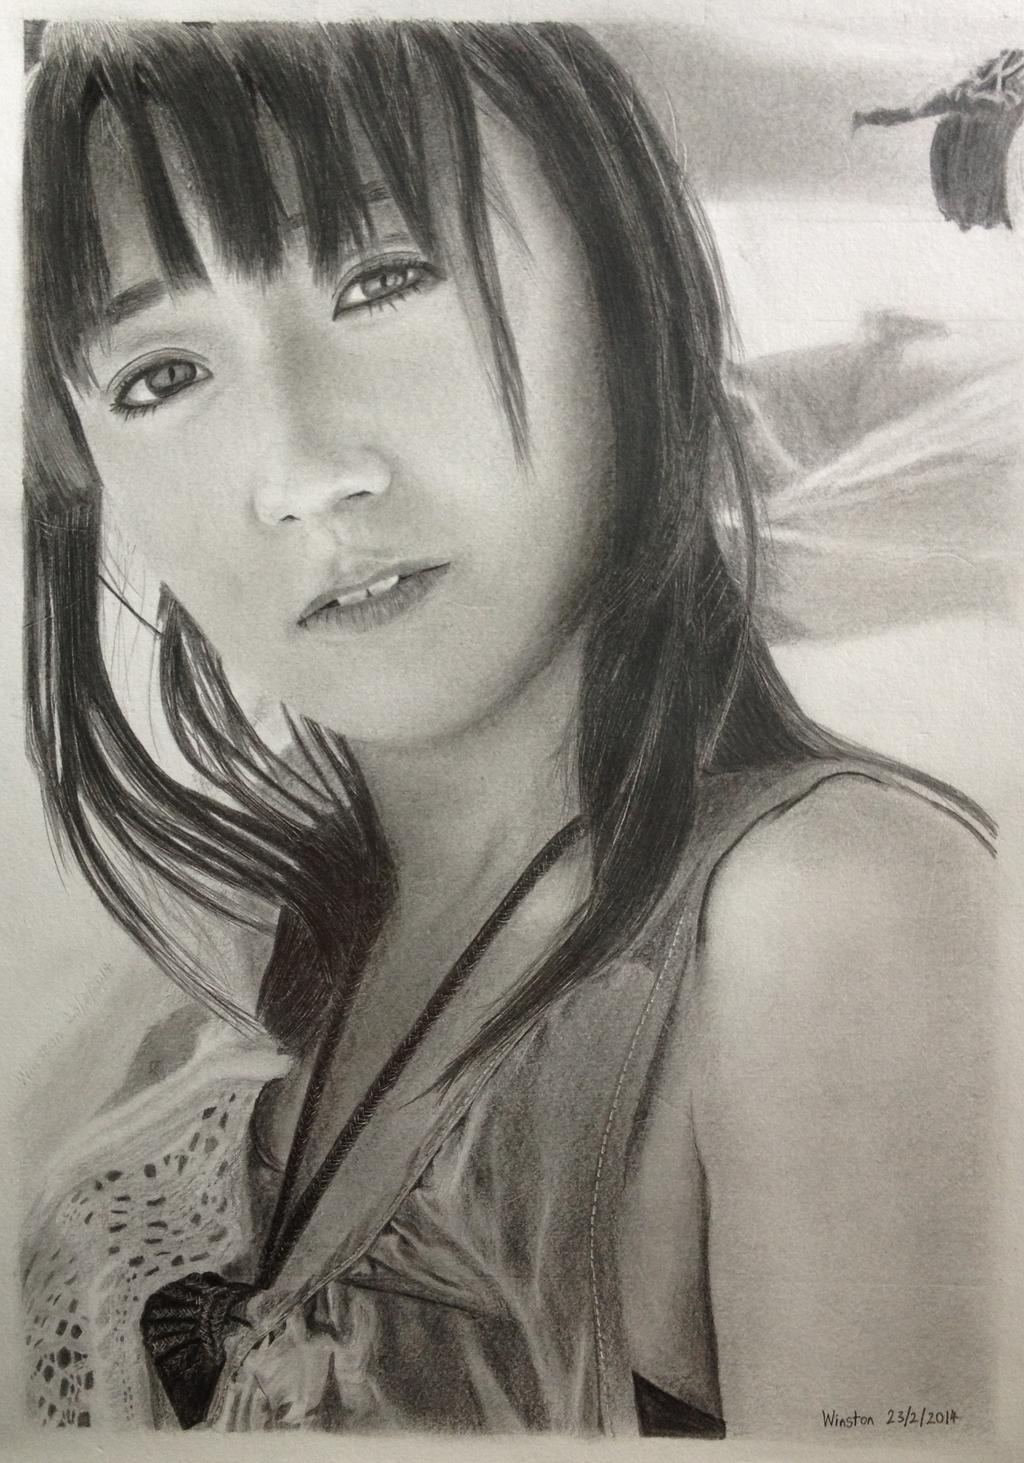 Yuko Oshima (13 - 23 February 2014) by WinstonSGC